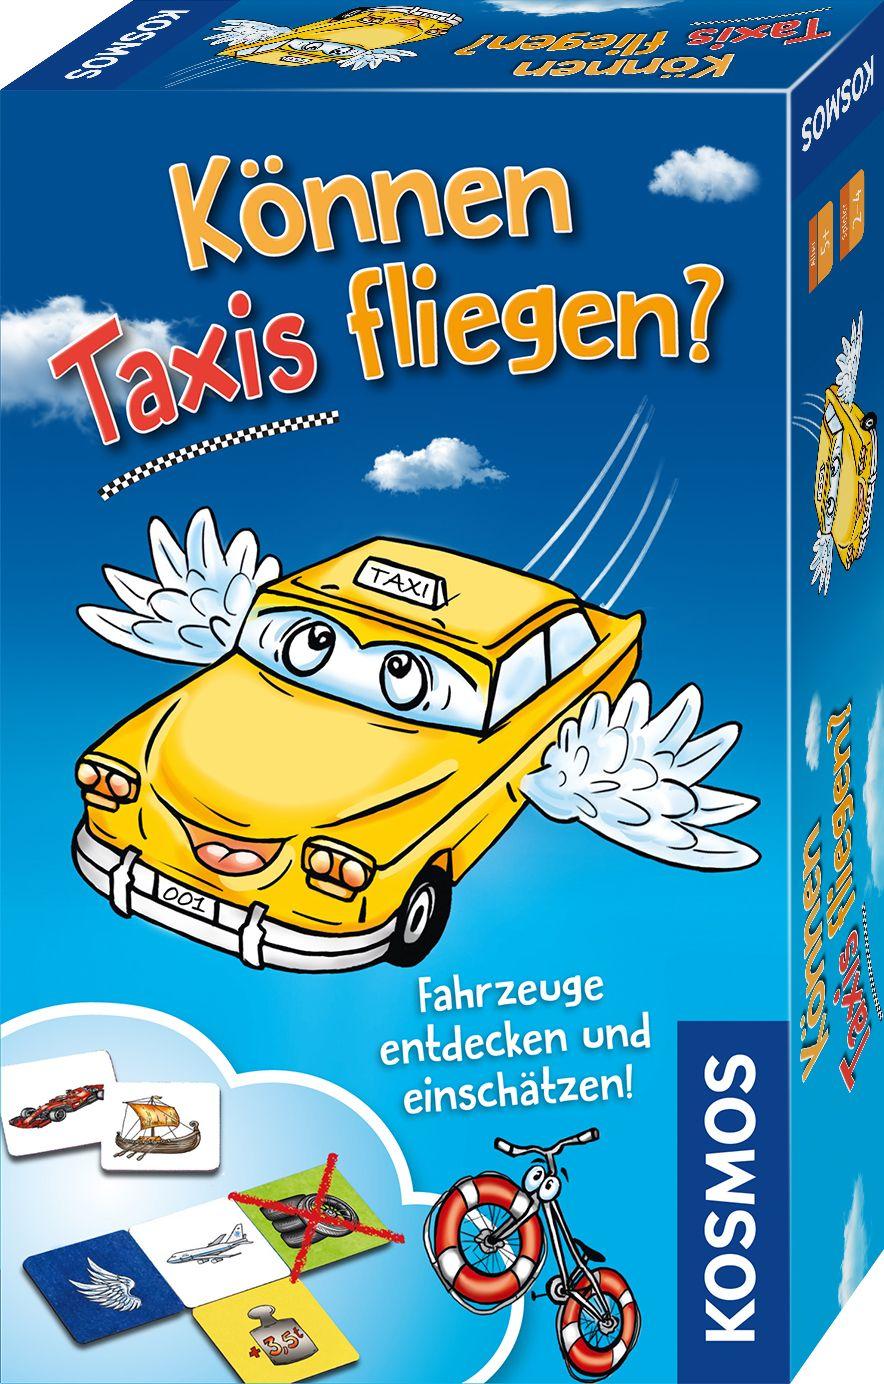 Können Taxis fliegen?